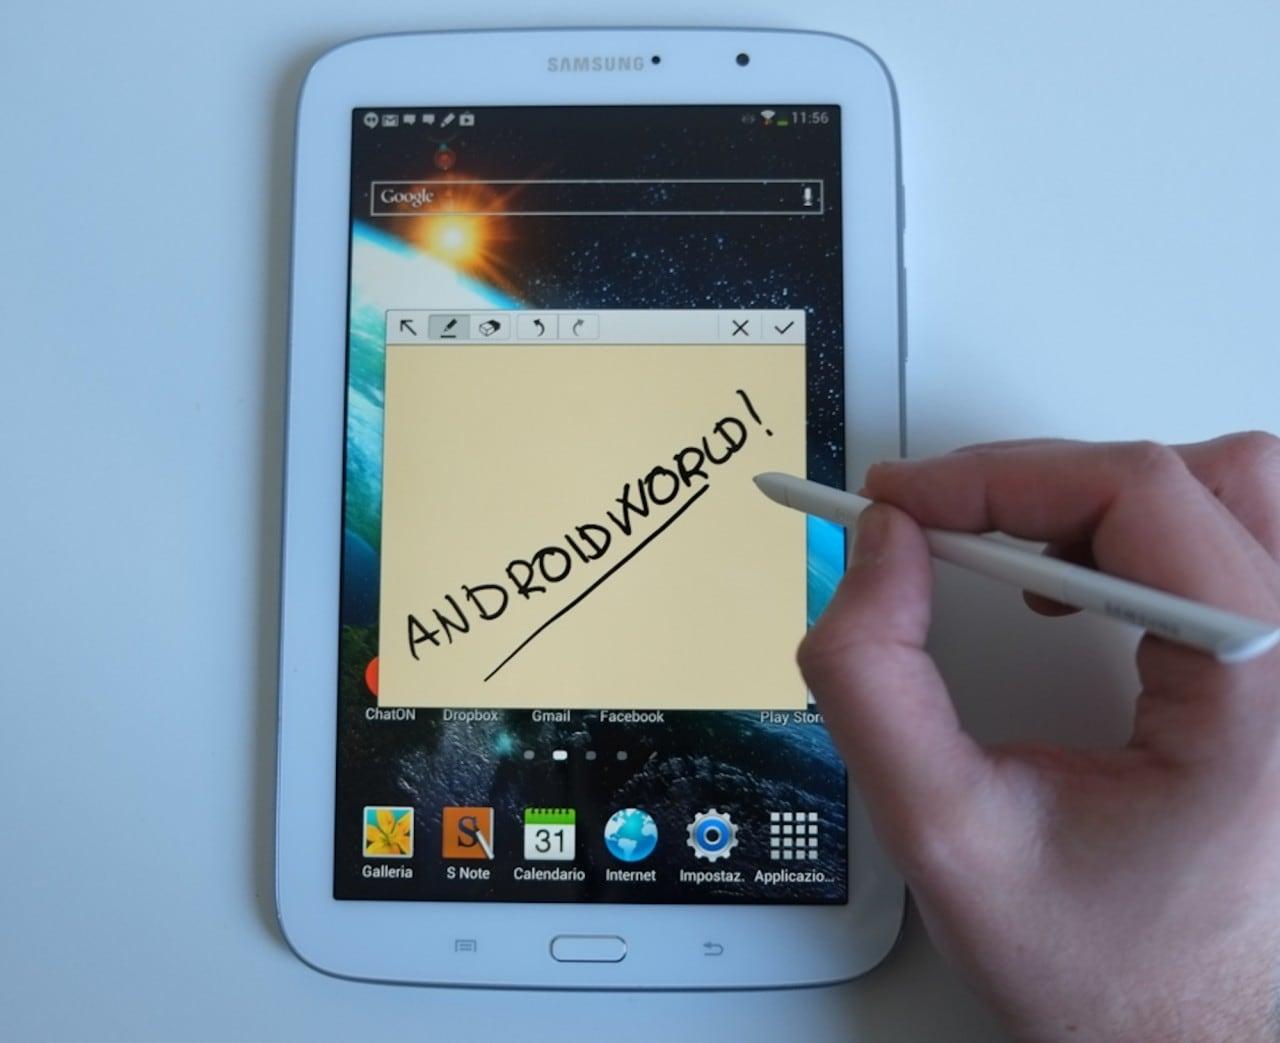 Samsung Galaxy Note 8 si aggiorna ad Android 4.4.2 KitKat in Italia